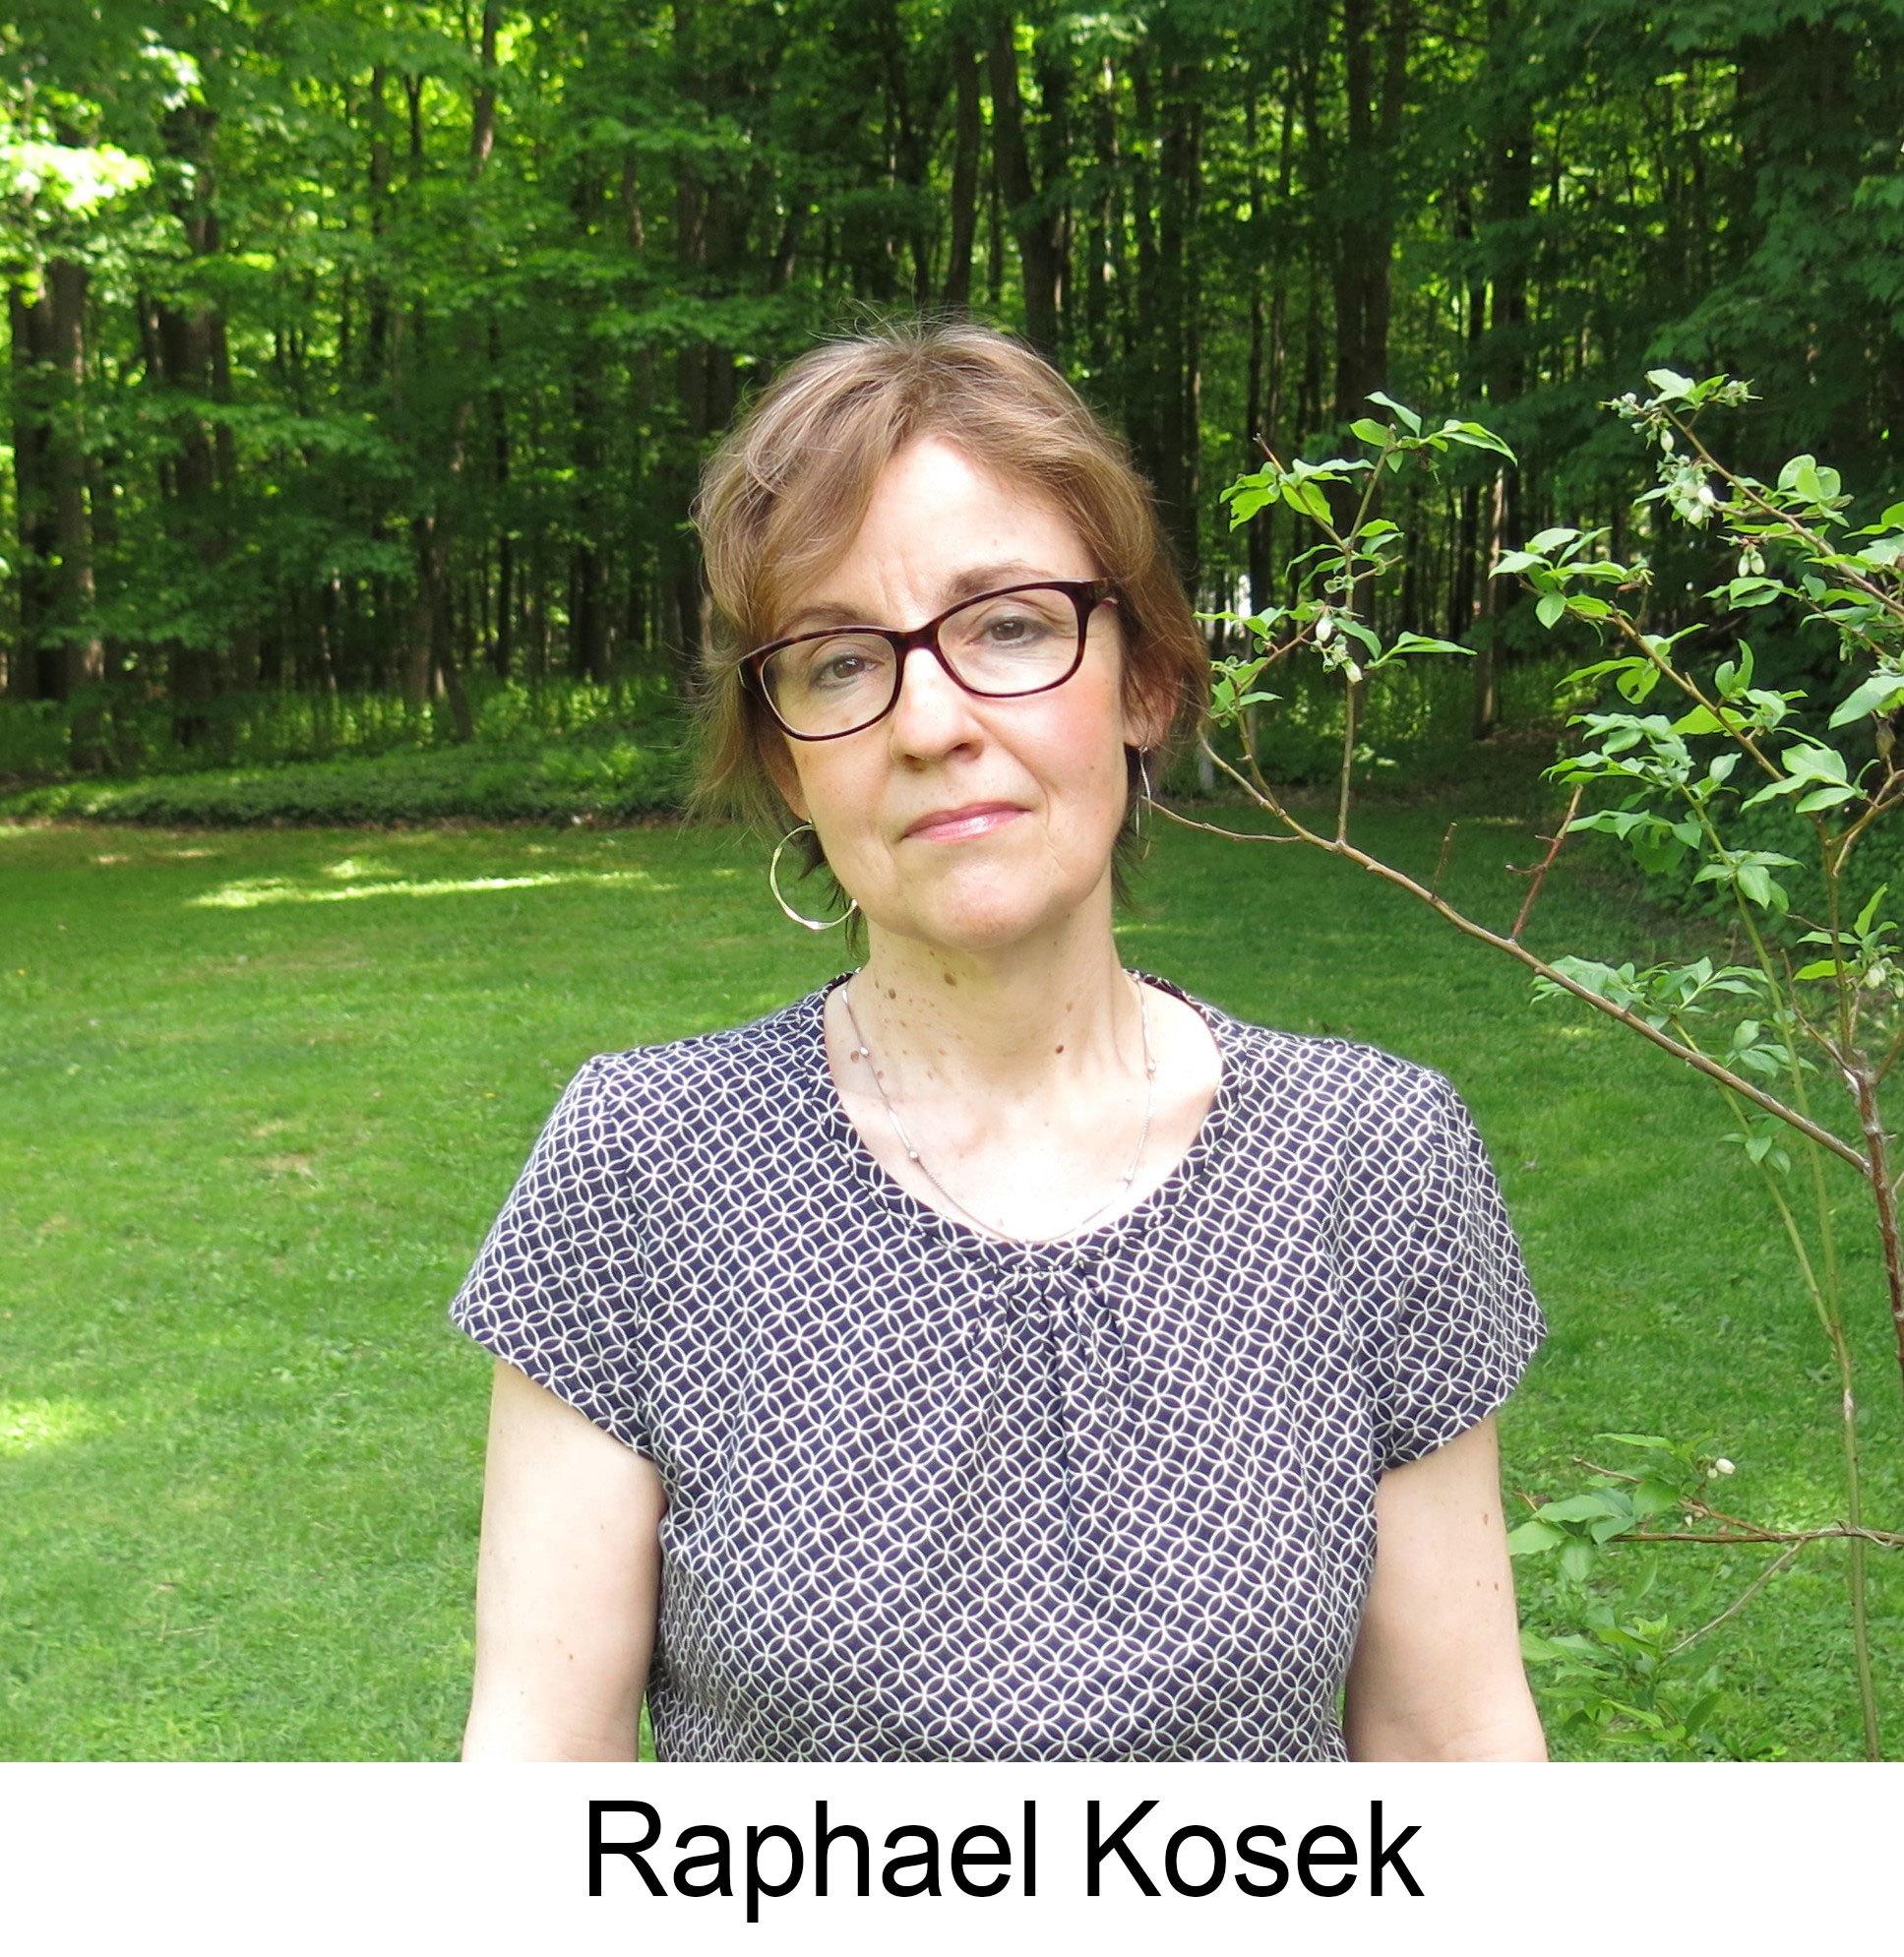 Molinaro Appoints Raphael Kosek as 2019 Dutchess County Poet Laureate